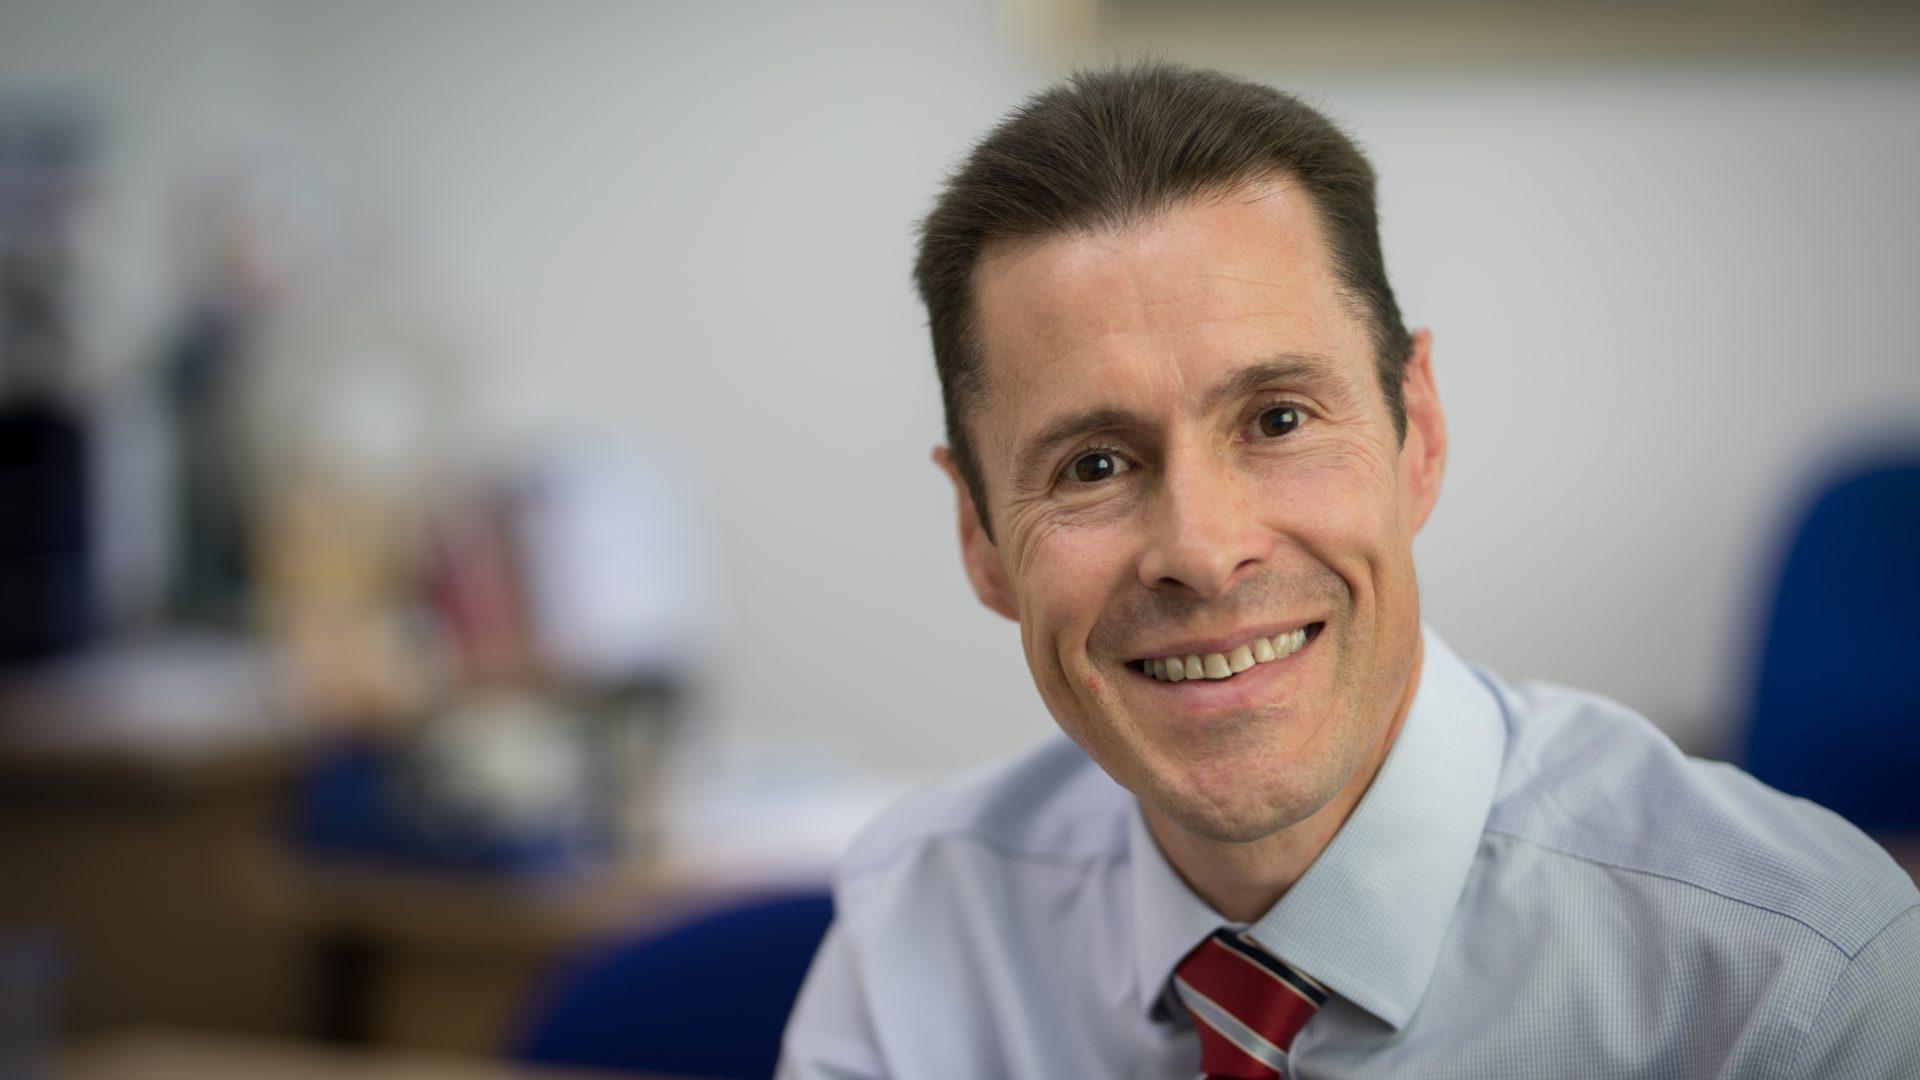 Jim McGeorge, University Secretary and Chief Operating Officer, University of Dundee.